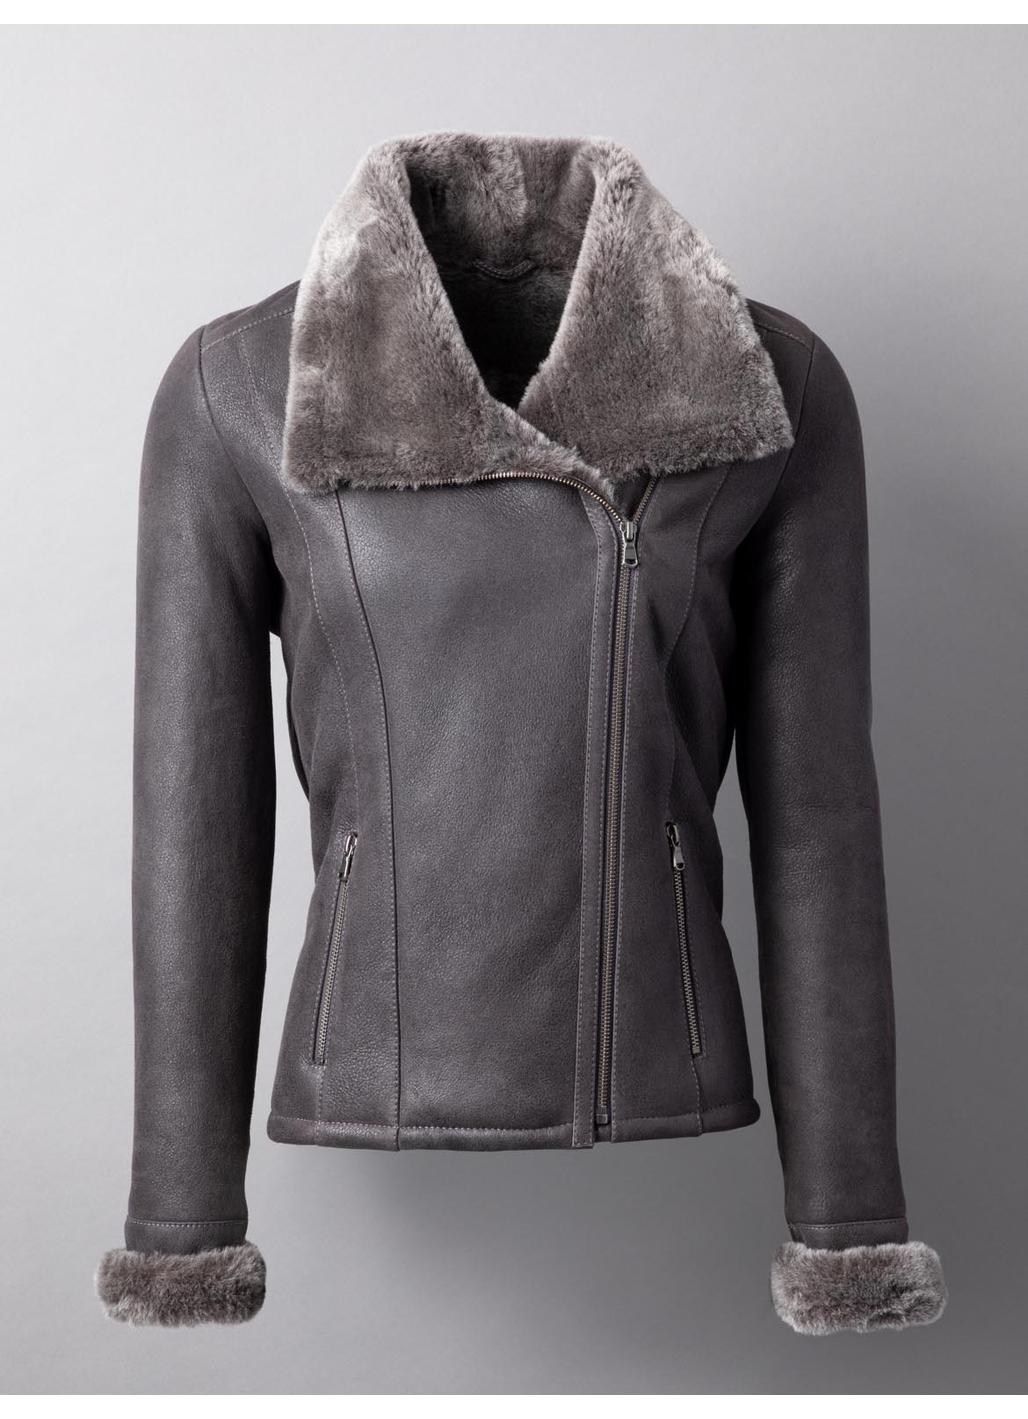 Arnside Sheepskin Aviator Jacket in Charcoal Grey